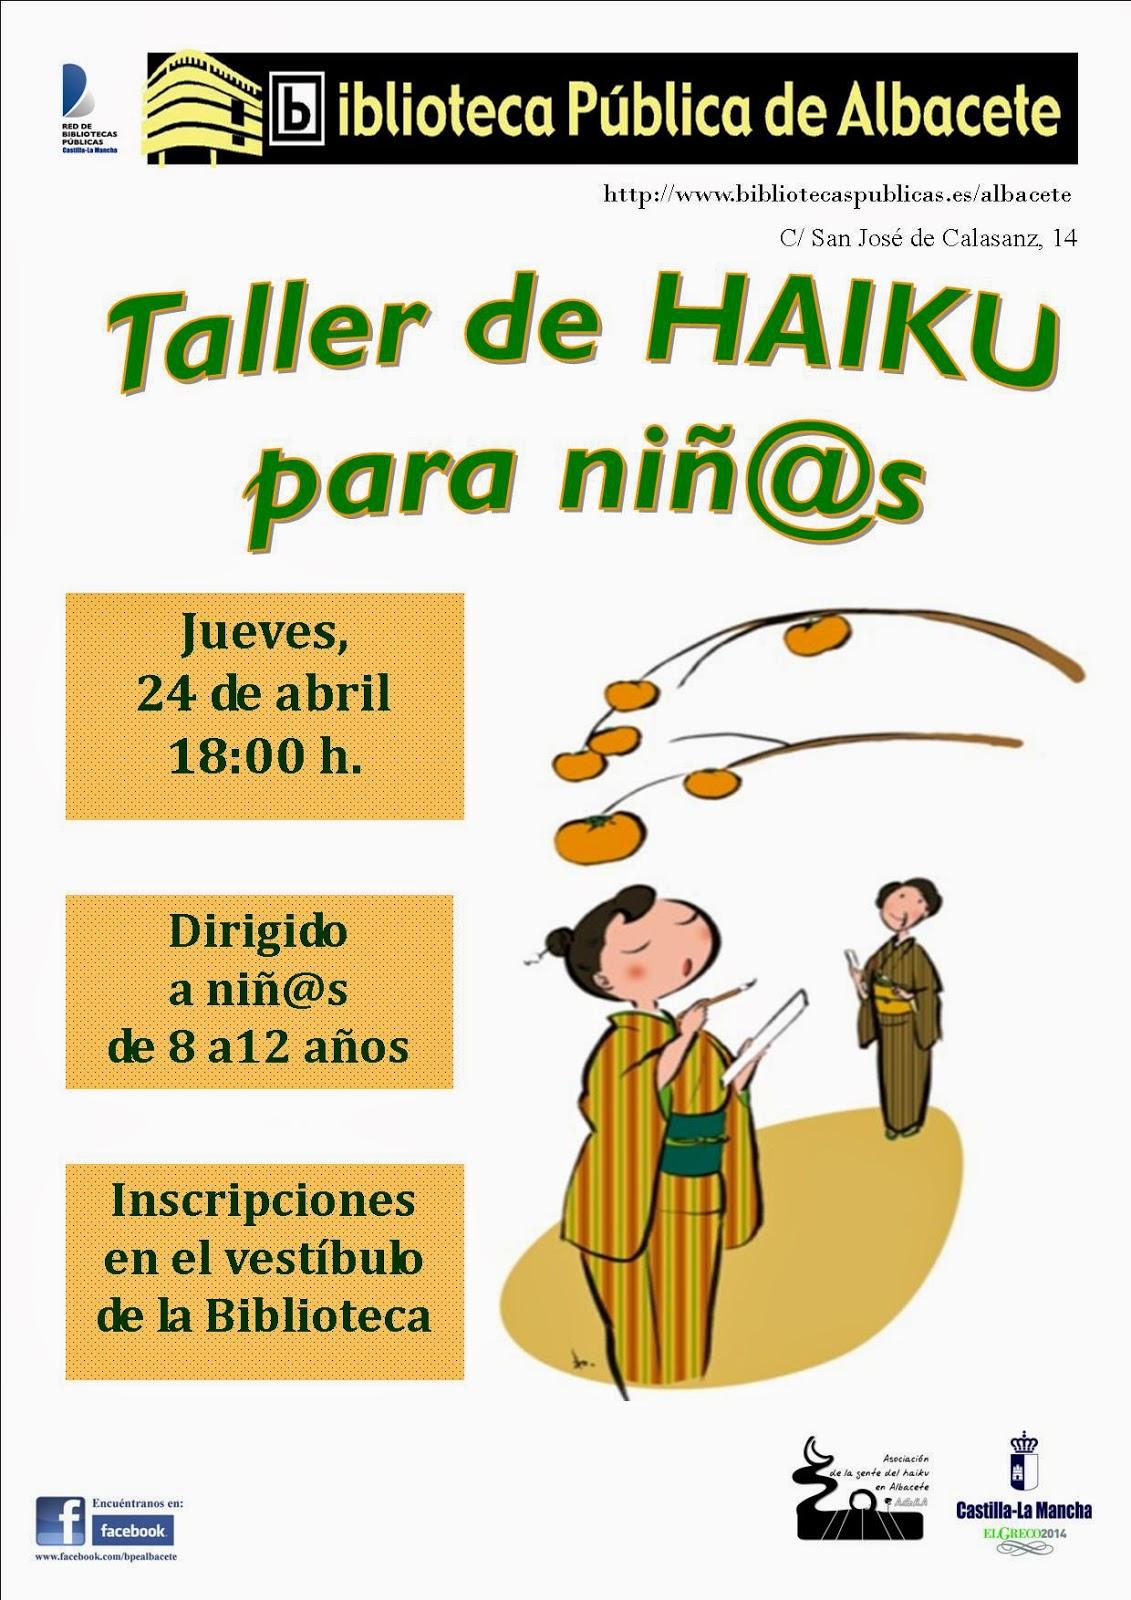 List of Haiku En Espanol Para Ninos ~ Apr 2016 watch movies online